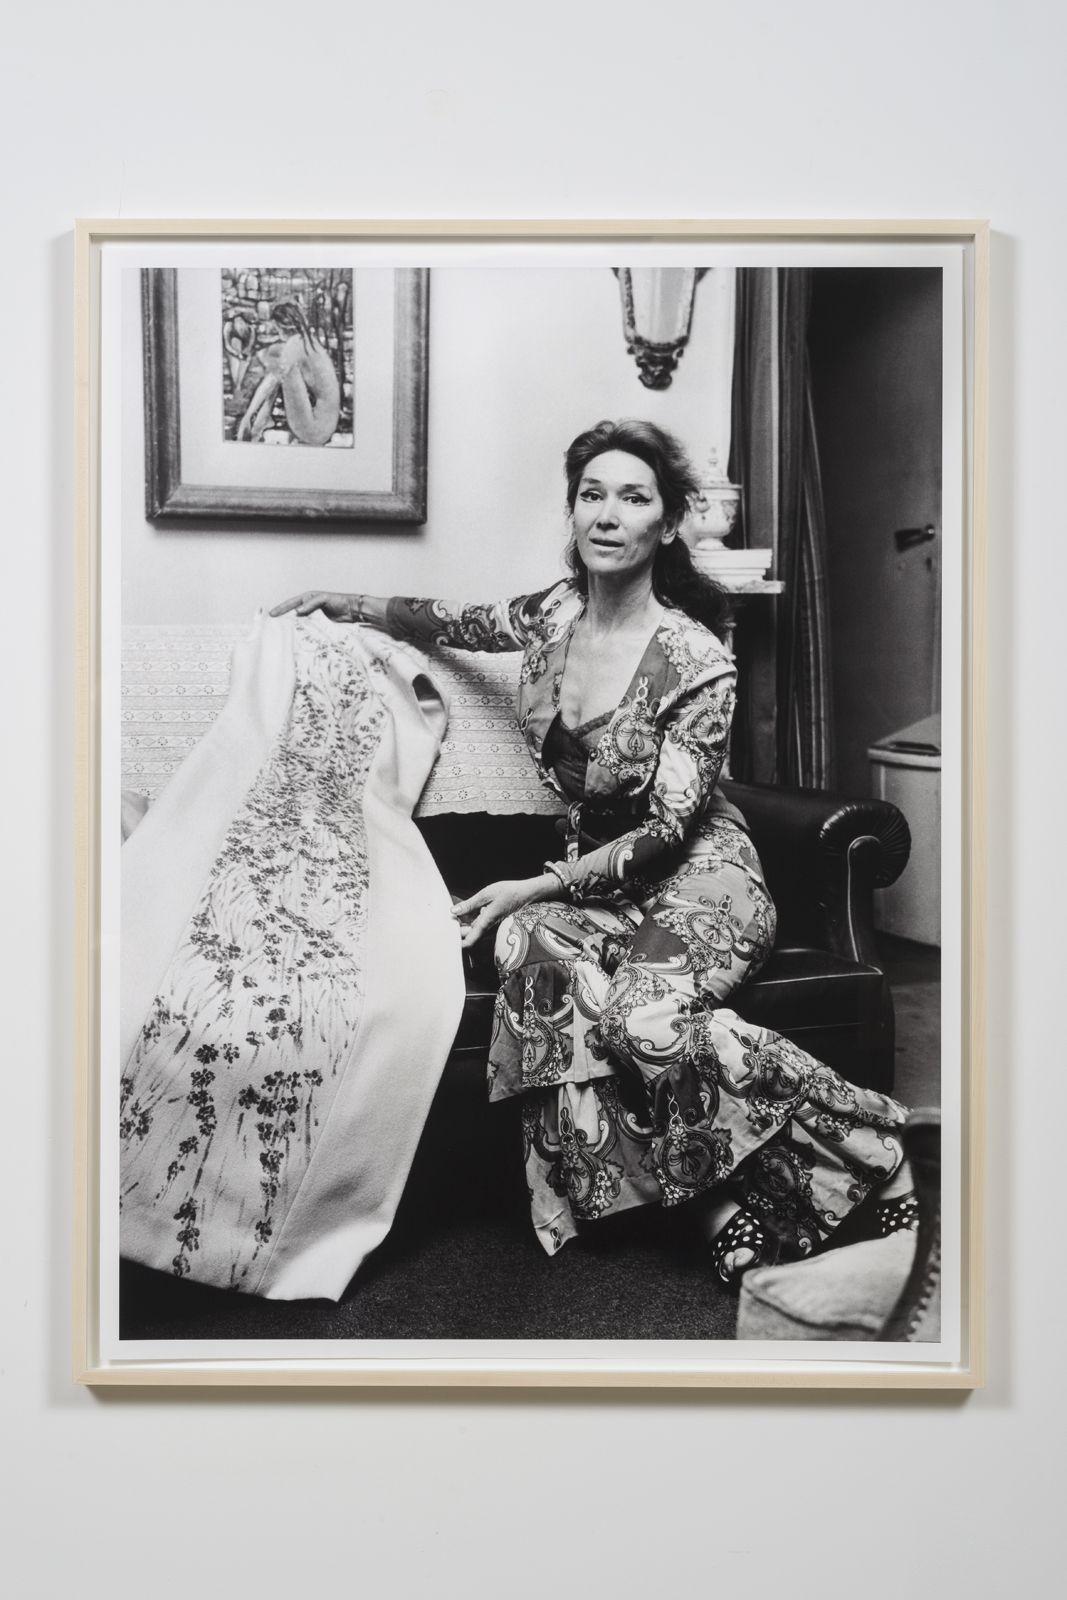 Number 1: Silvana, 2015, Archival pigment print